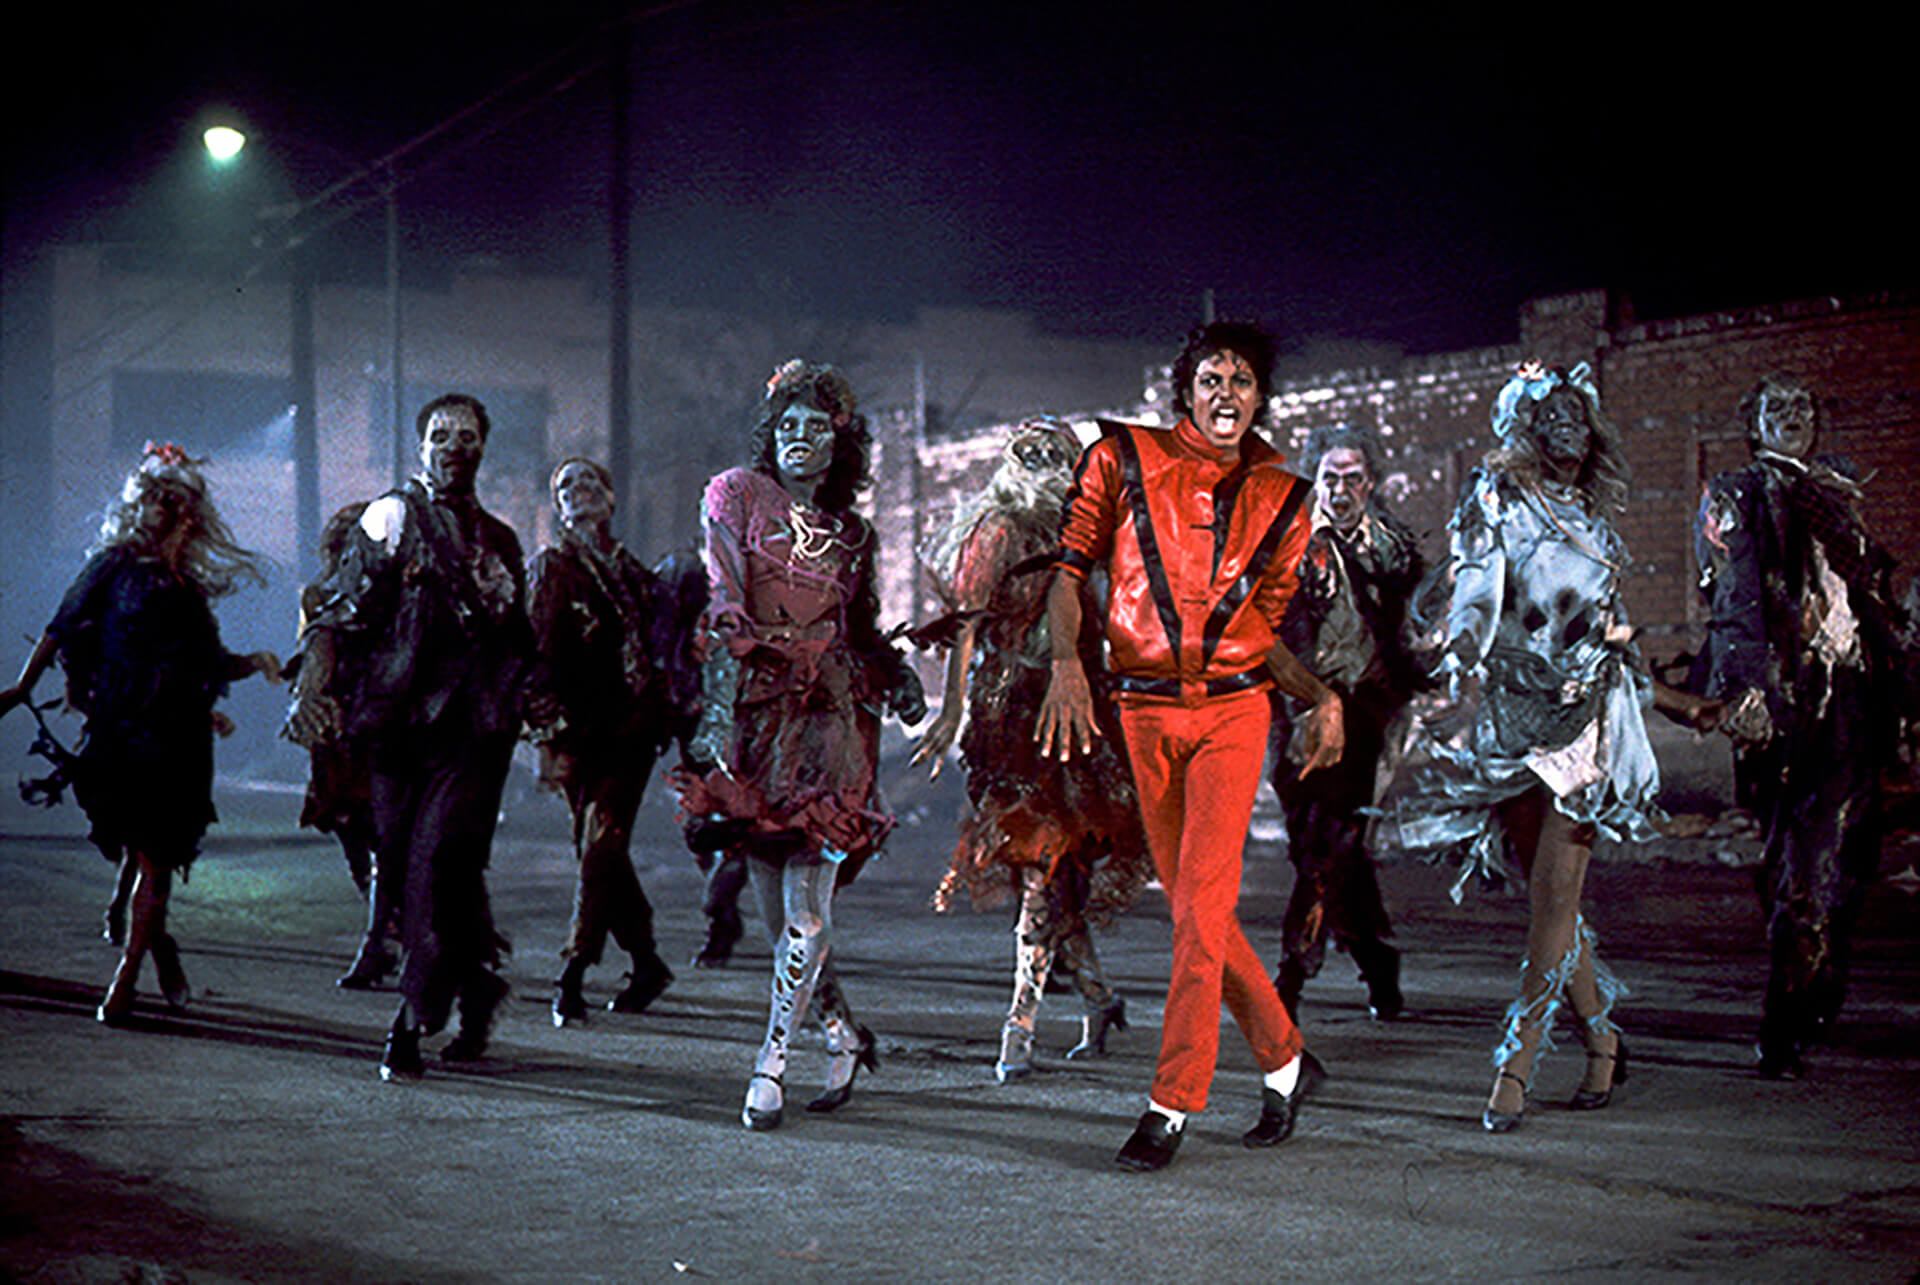 FUJIFILM SQUARE企画展「MJ」~ステージ・オブ・マイケル・ジャクソン~